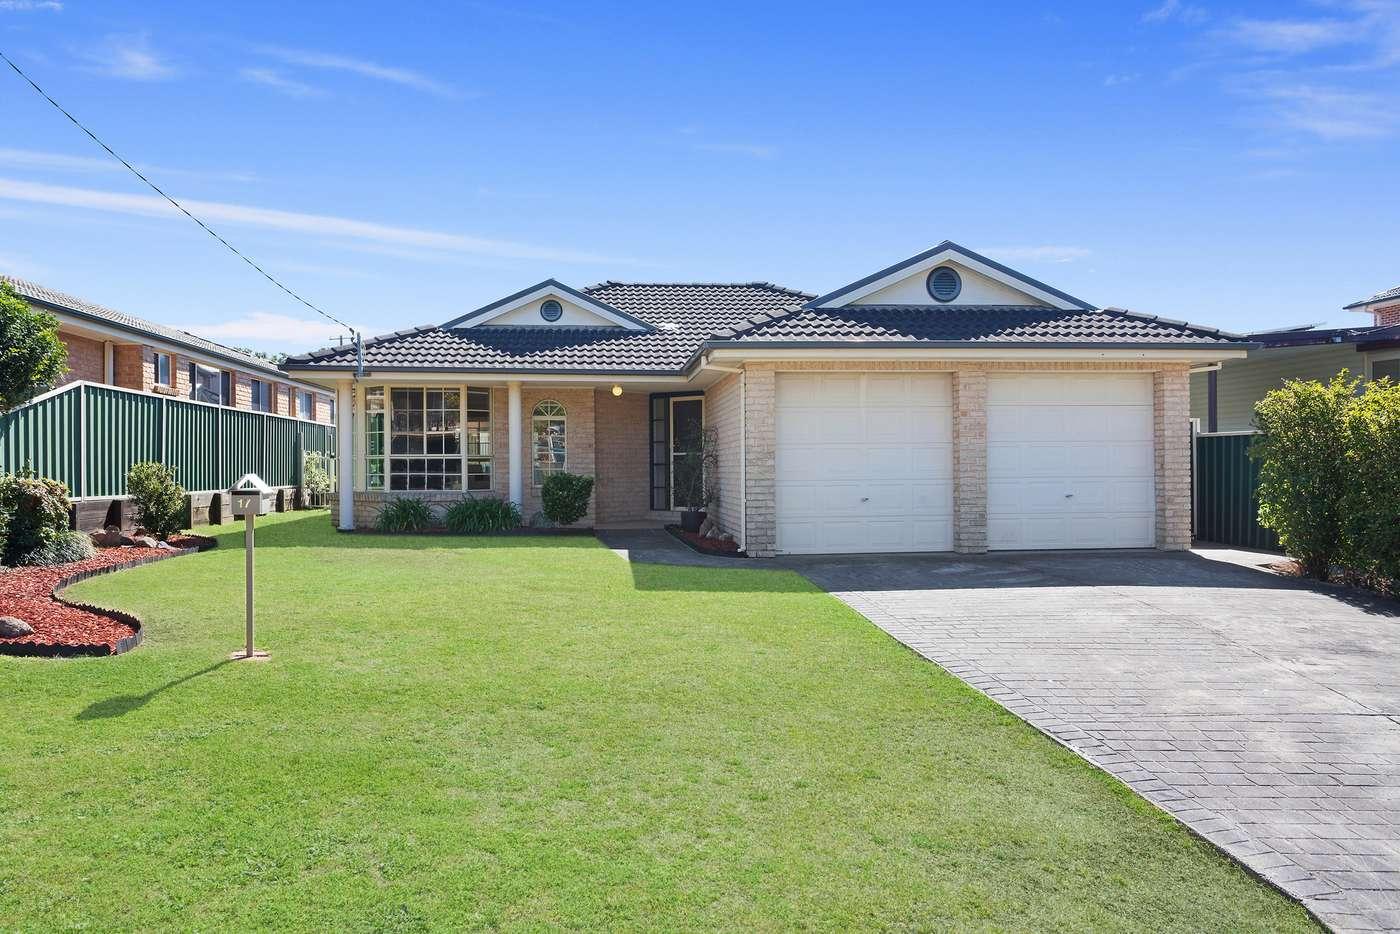 Main view of Homely house listing, 17 Ulana Avenue, Halekulani NSW 2262